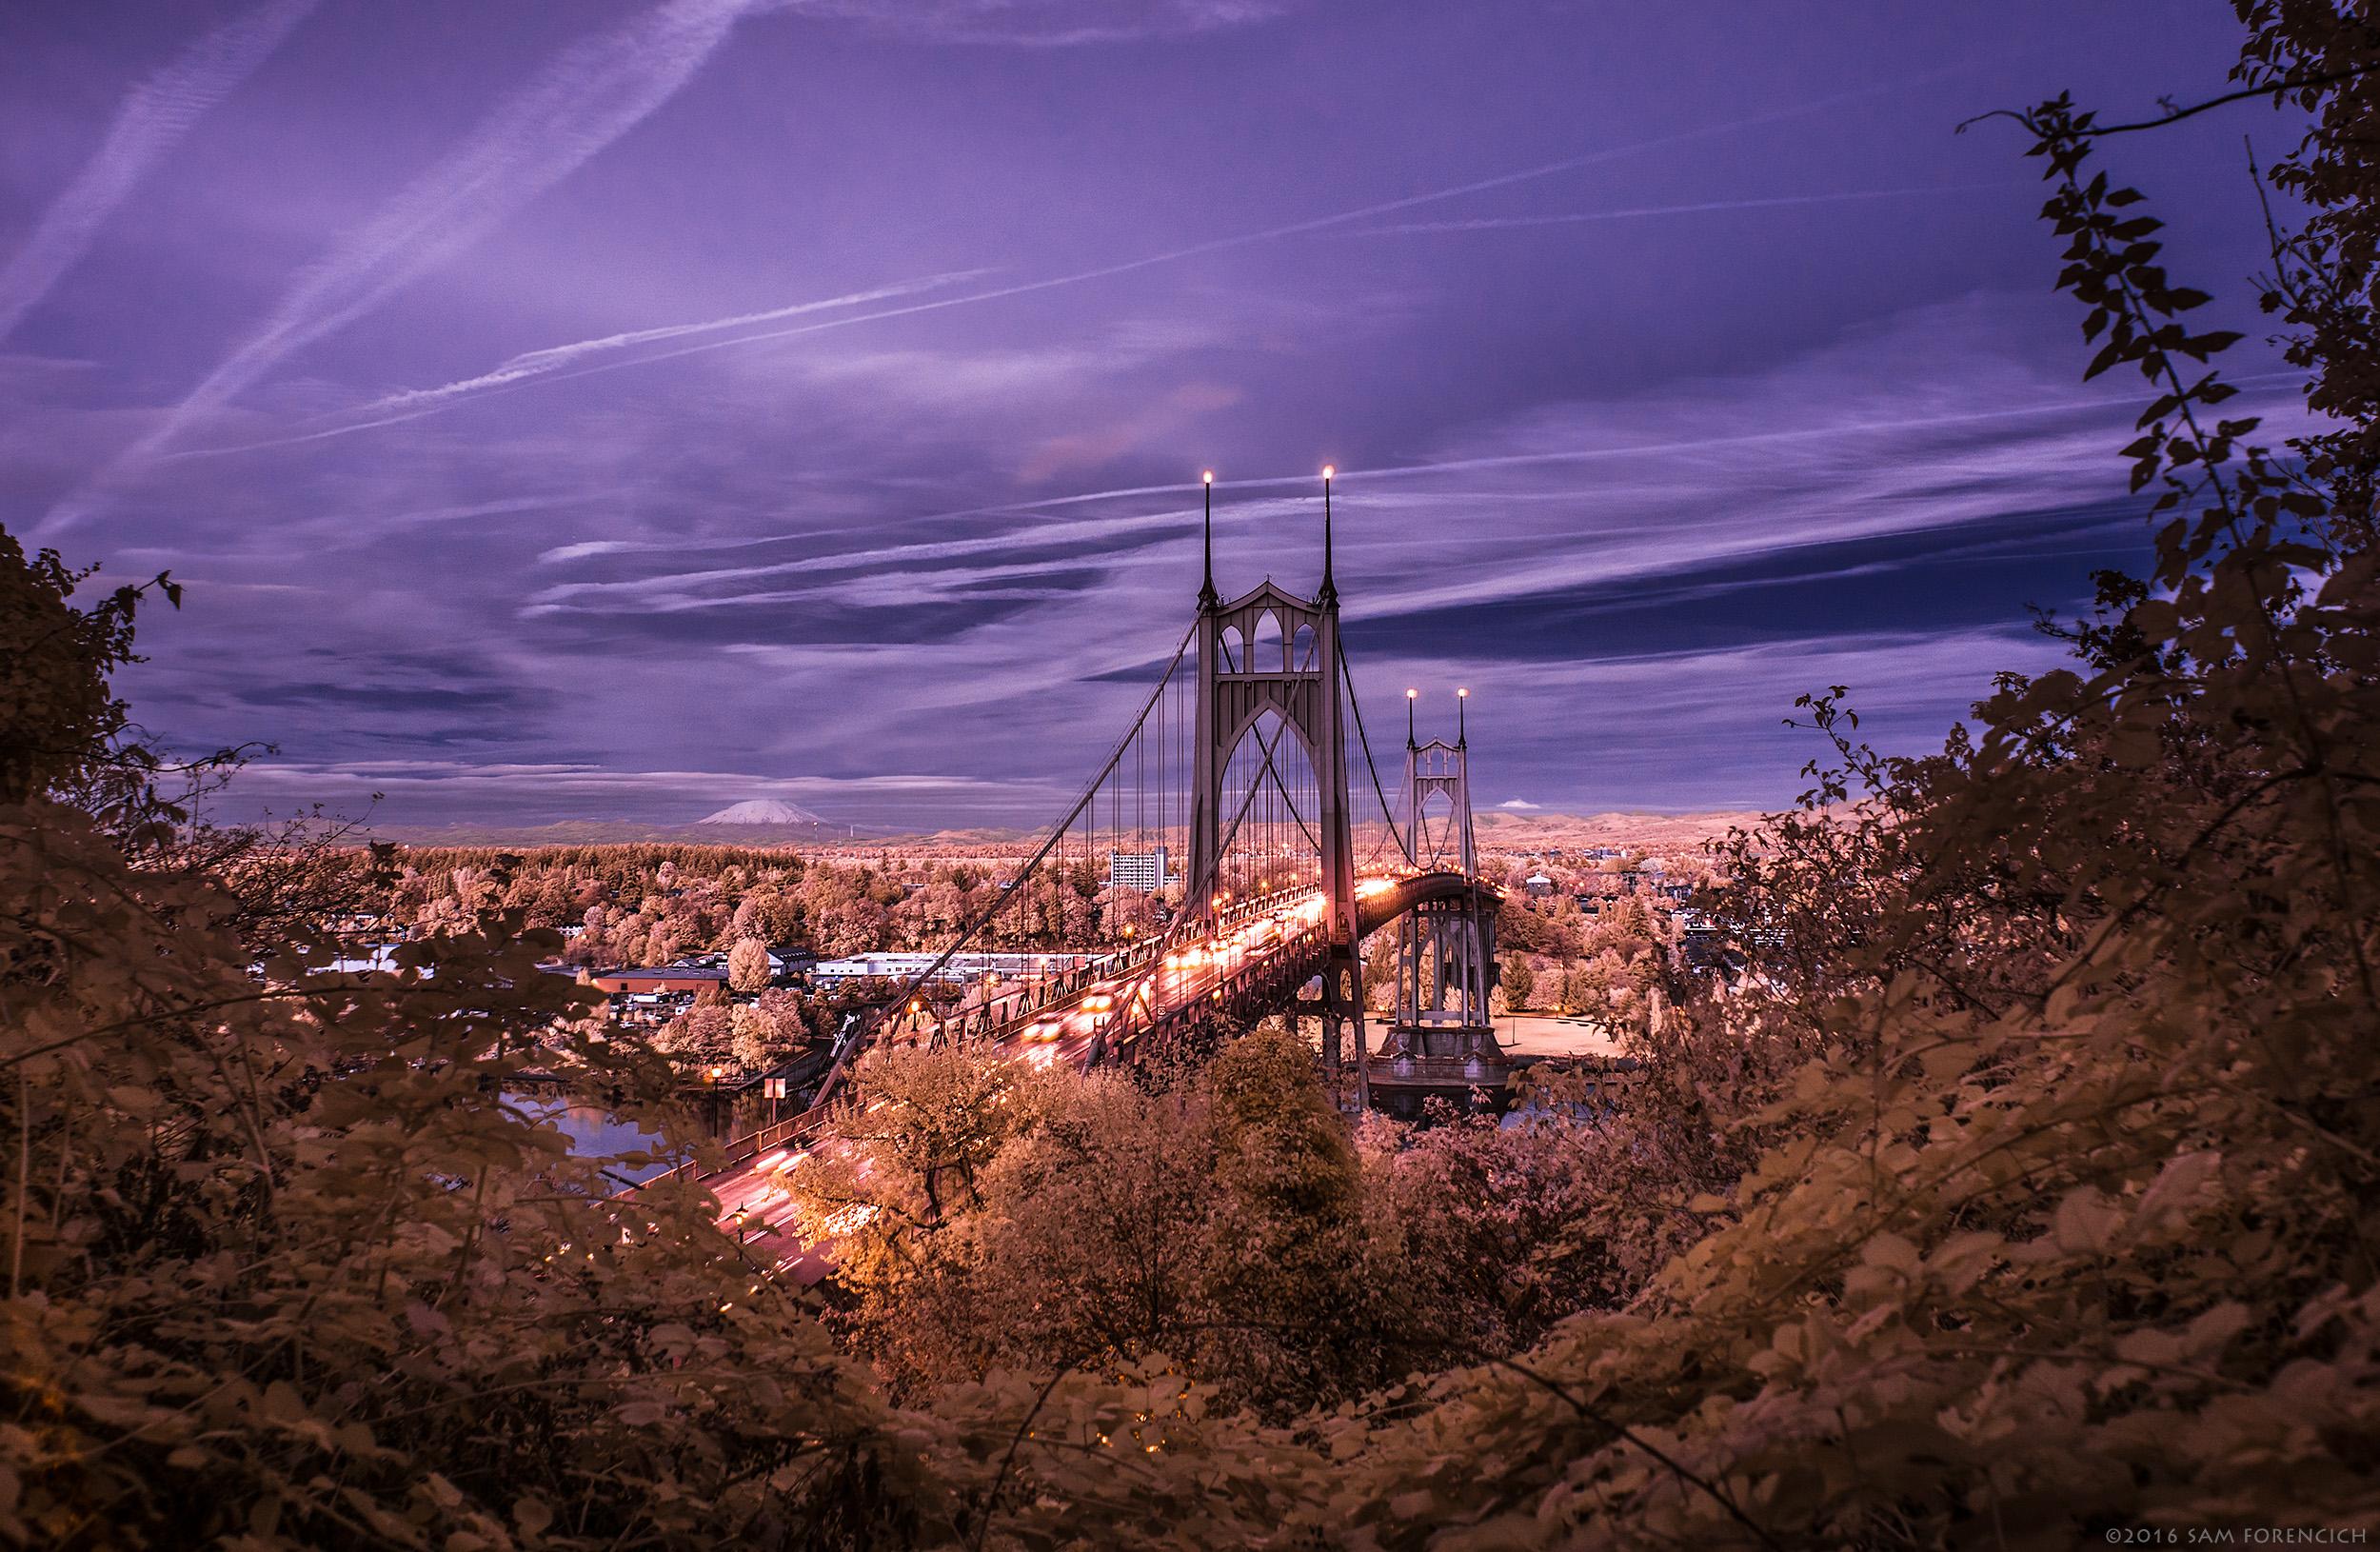 Twilight falls over the St. Johns Bridge in Portland, Oregon. IR converted Nikon D750. © 2016 Sam Forencich